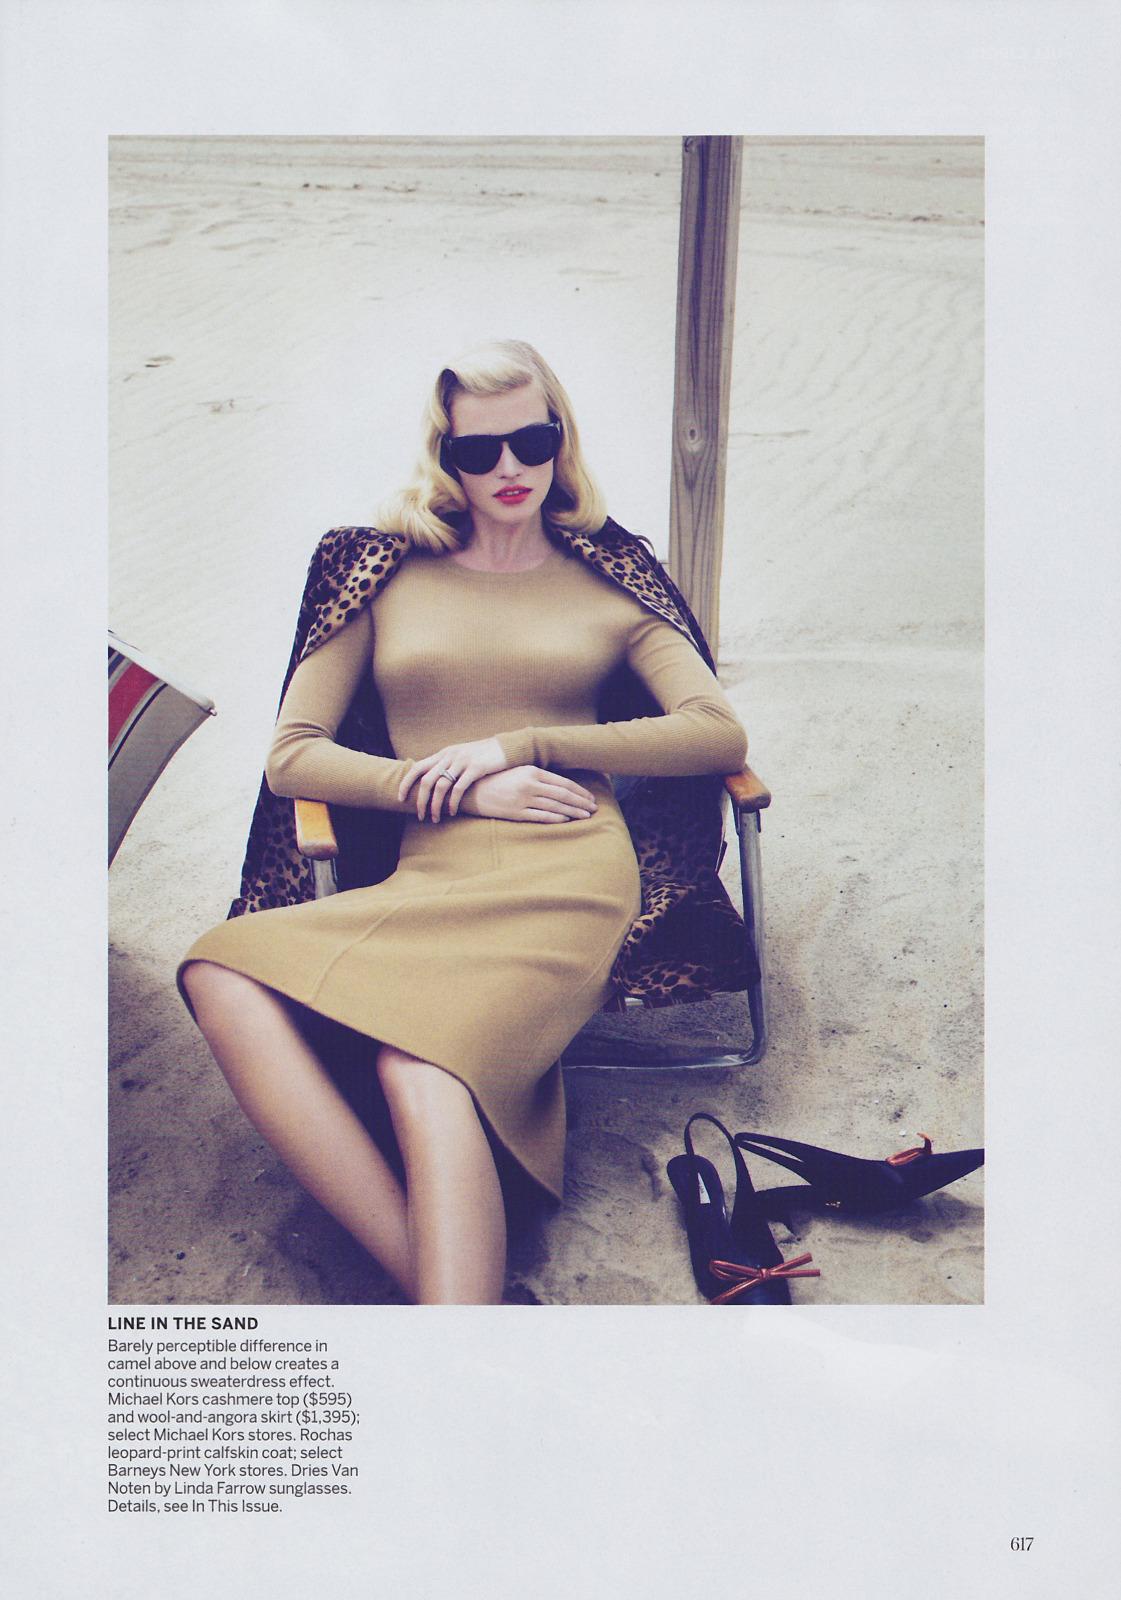 http://1.bp.blogspot.com/_mKeaqyocUS0/THWS8llvm1I/AAAAAAAAEt4/FWFRphq_os8/s1600/47563_LaraStone_Vogue_Sept20108_122_368lo.jpg